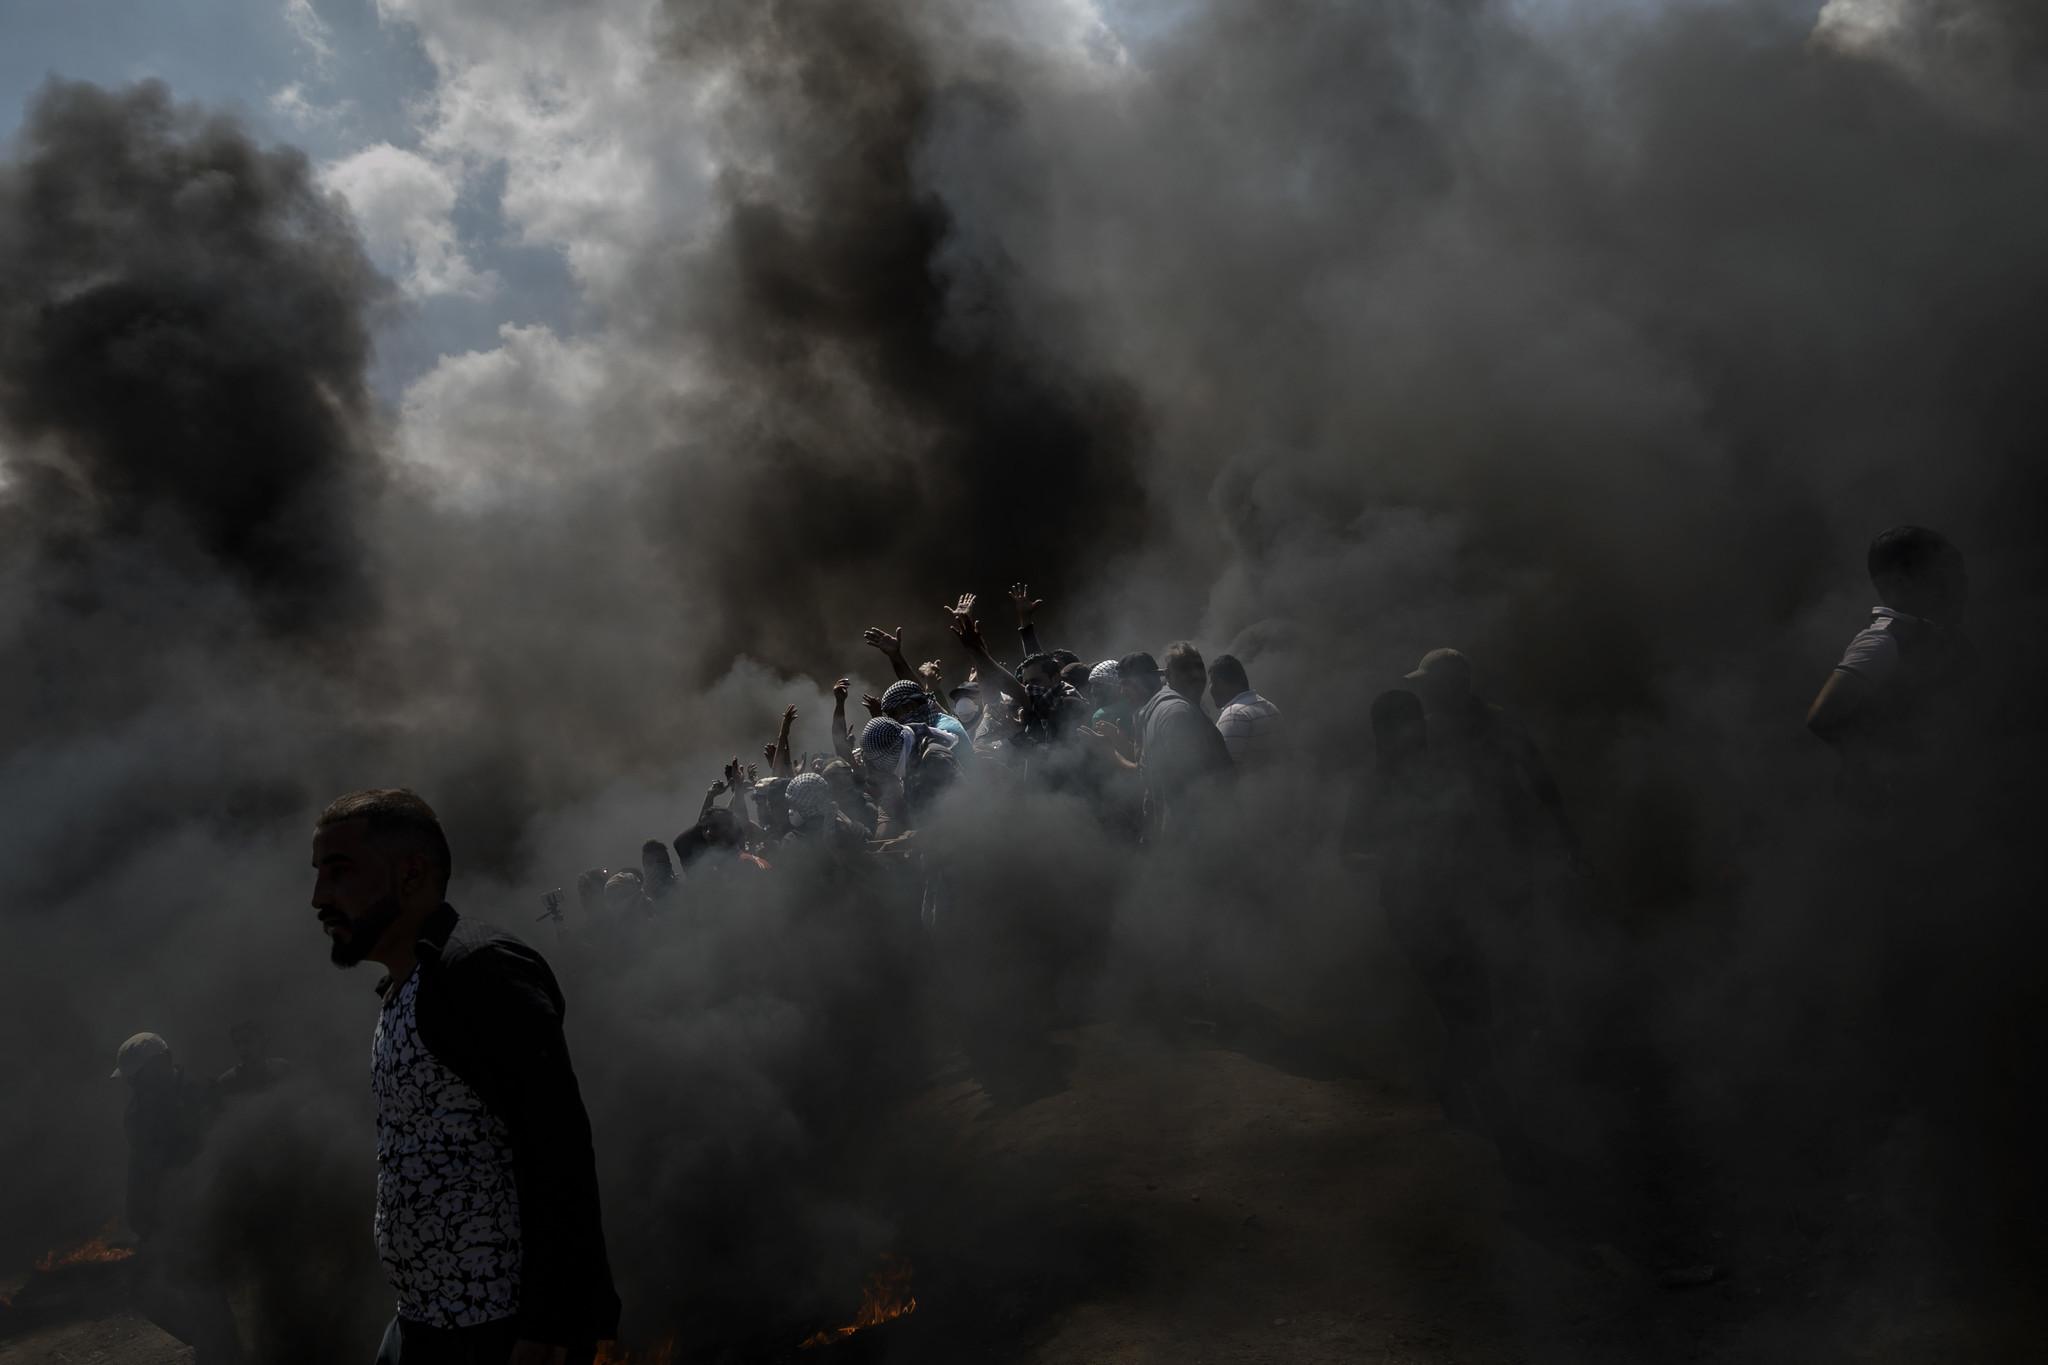 GAZA CITY, GAZA — MONDAY, MAY 14, 2018: Palestinians gather around to cheer and chant as they burn